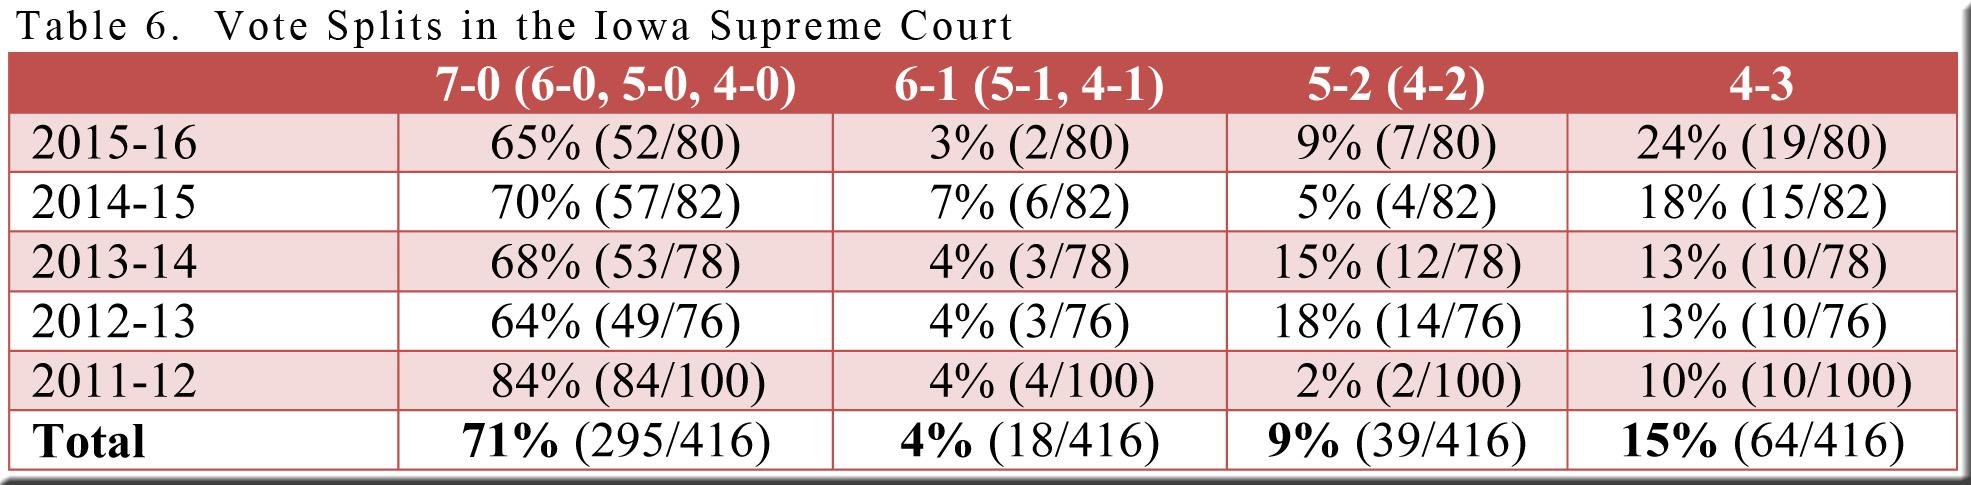 table-6-io-vote-splits-2011-12-thru-2015-16